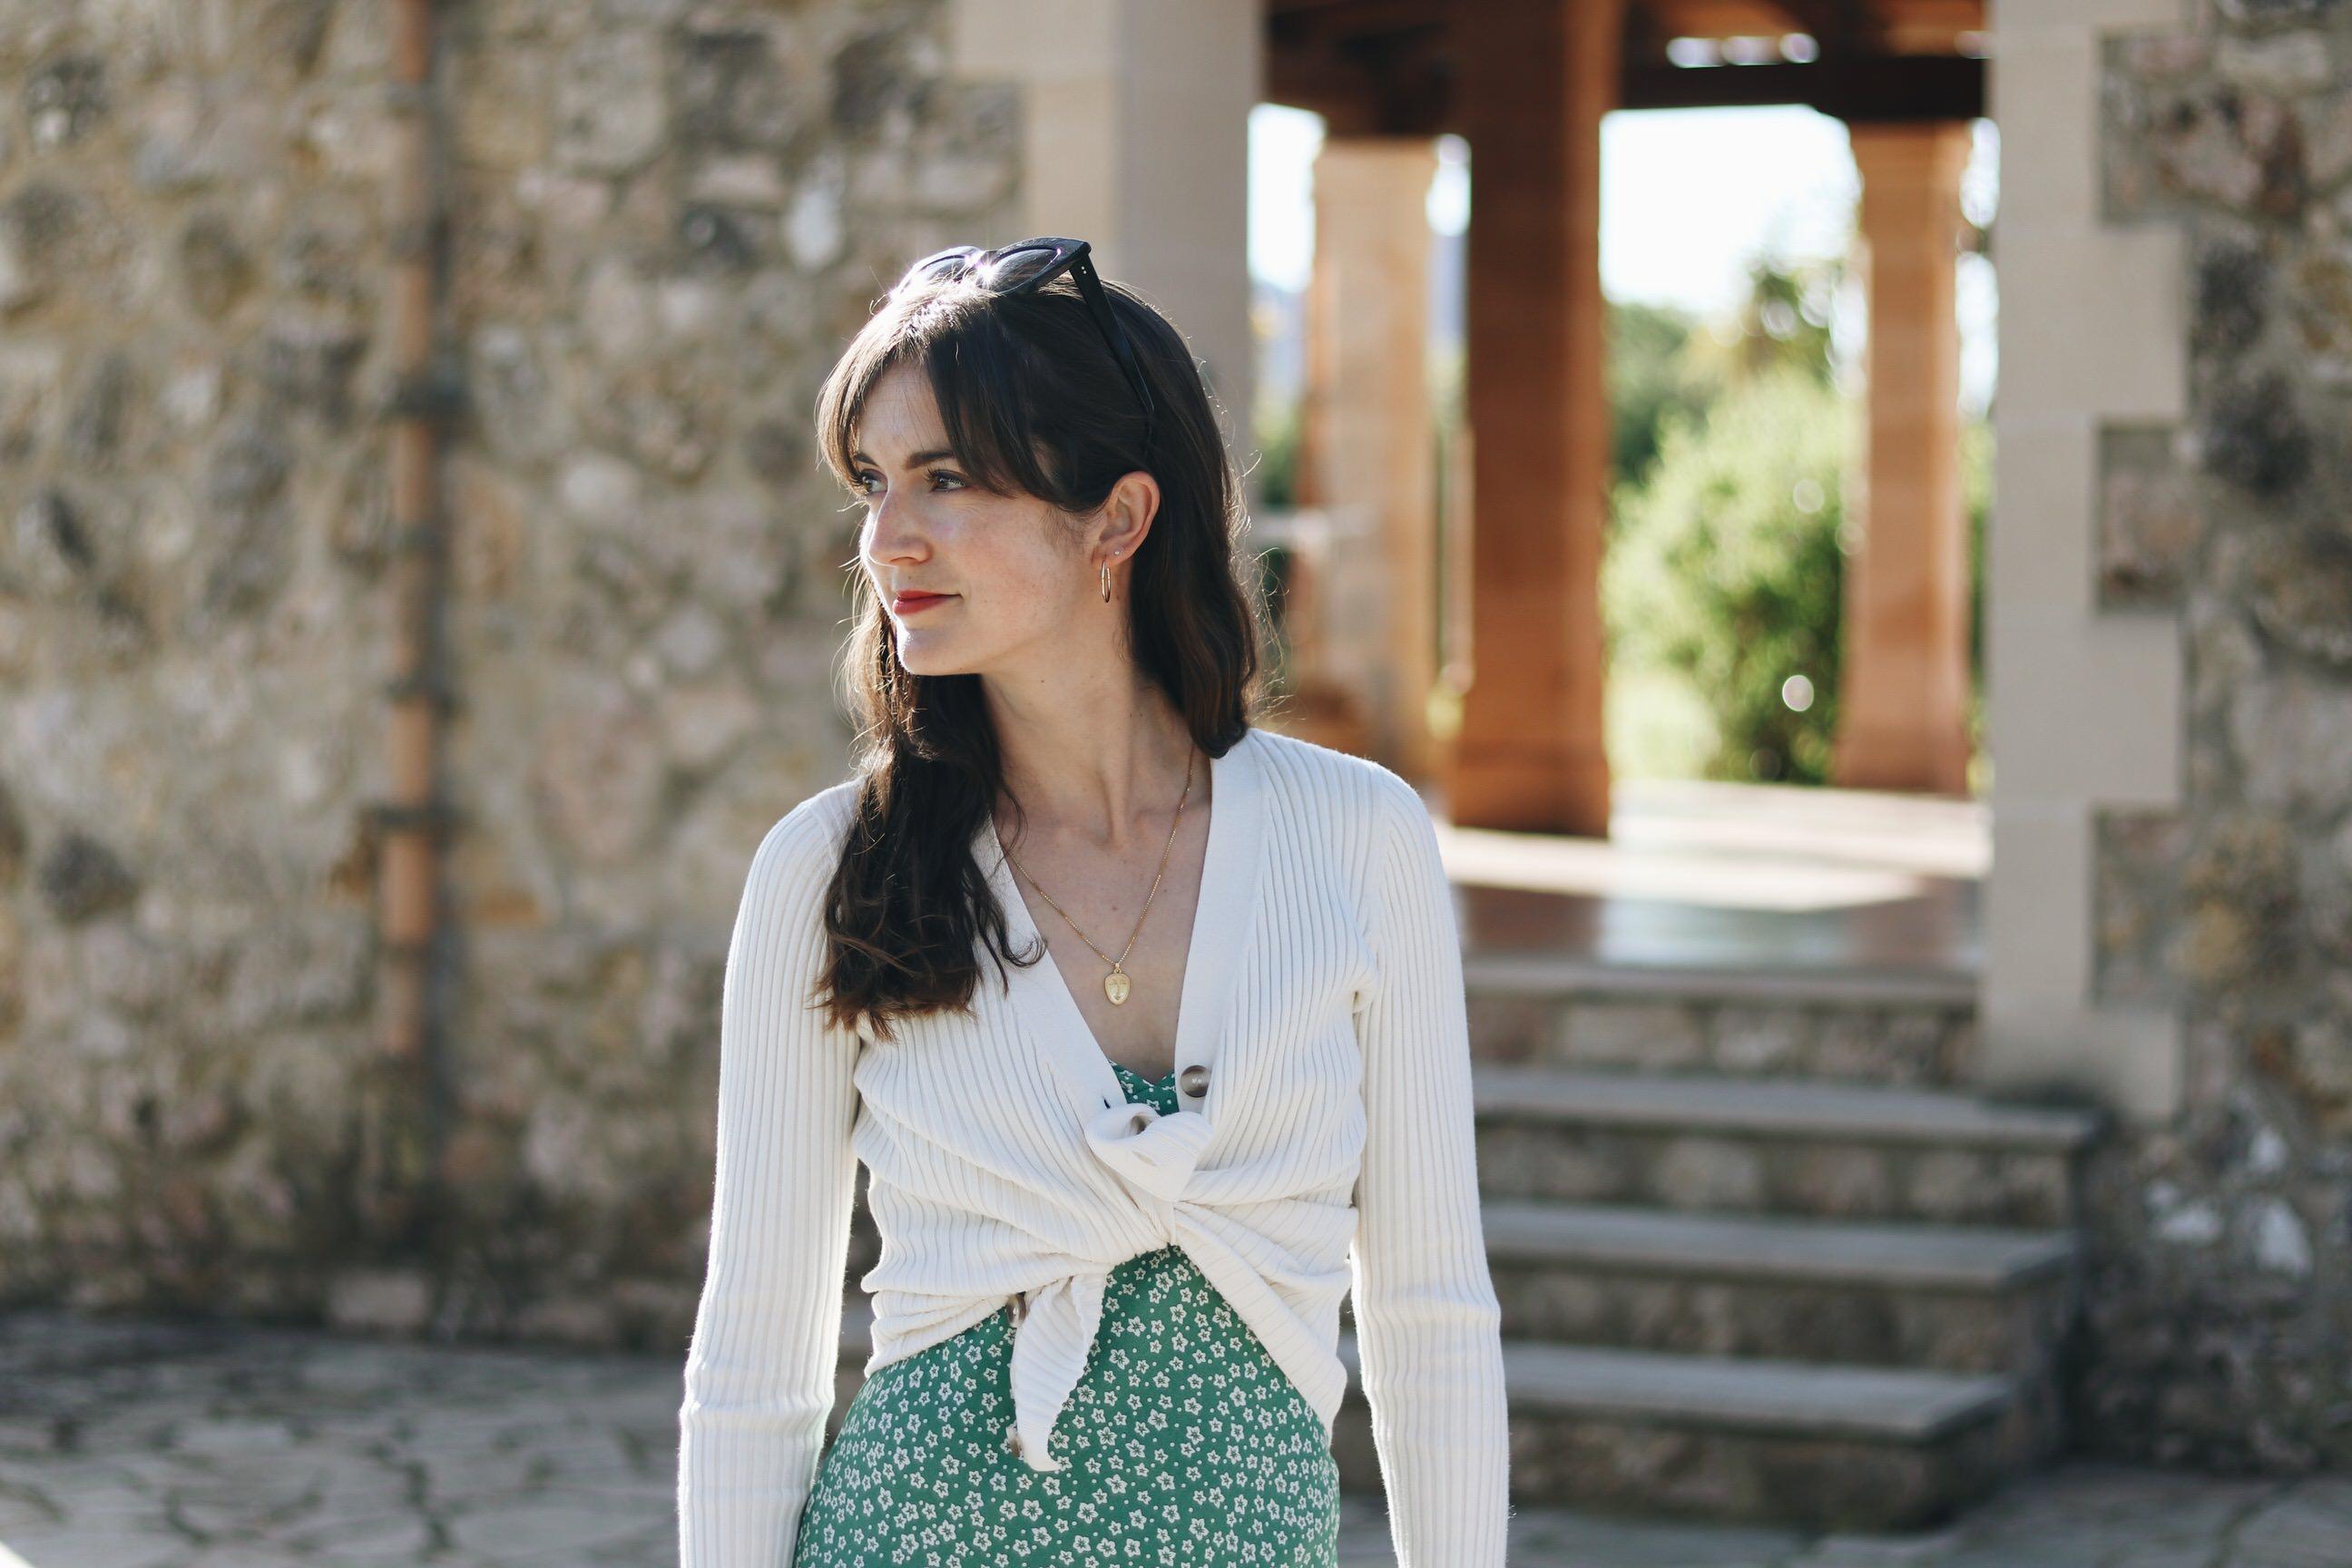 Cardigan kombinieren Outfit Sommer Bloggerin Freiburg Mallorca Blumenmuster